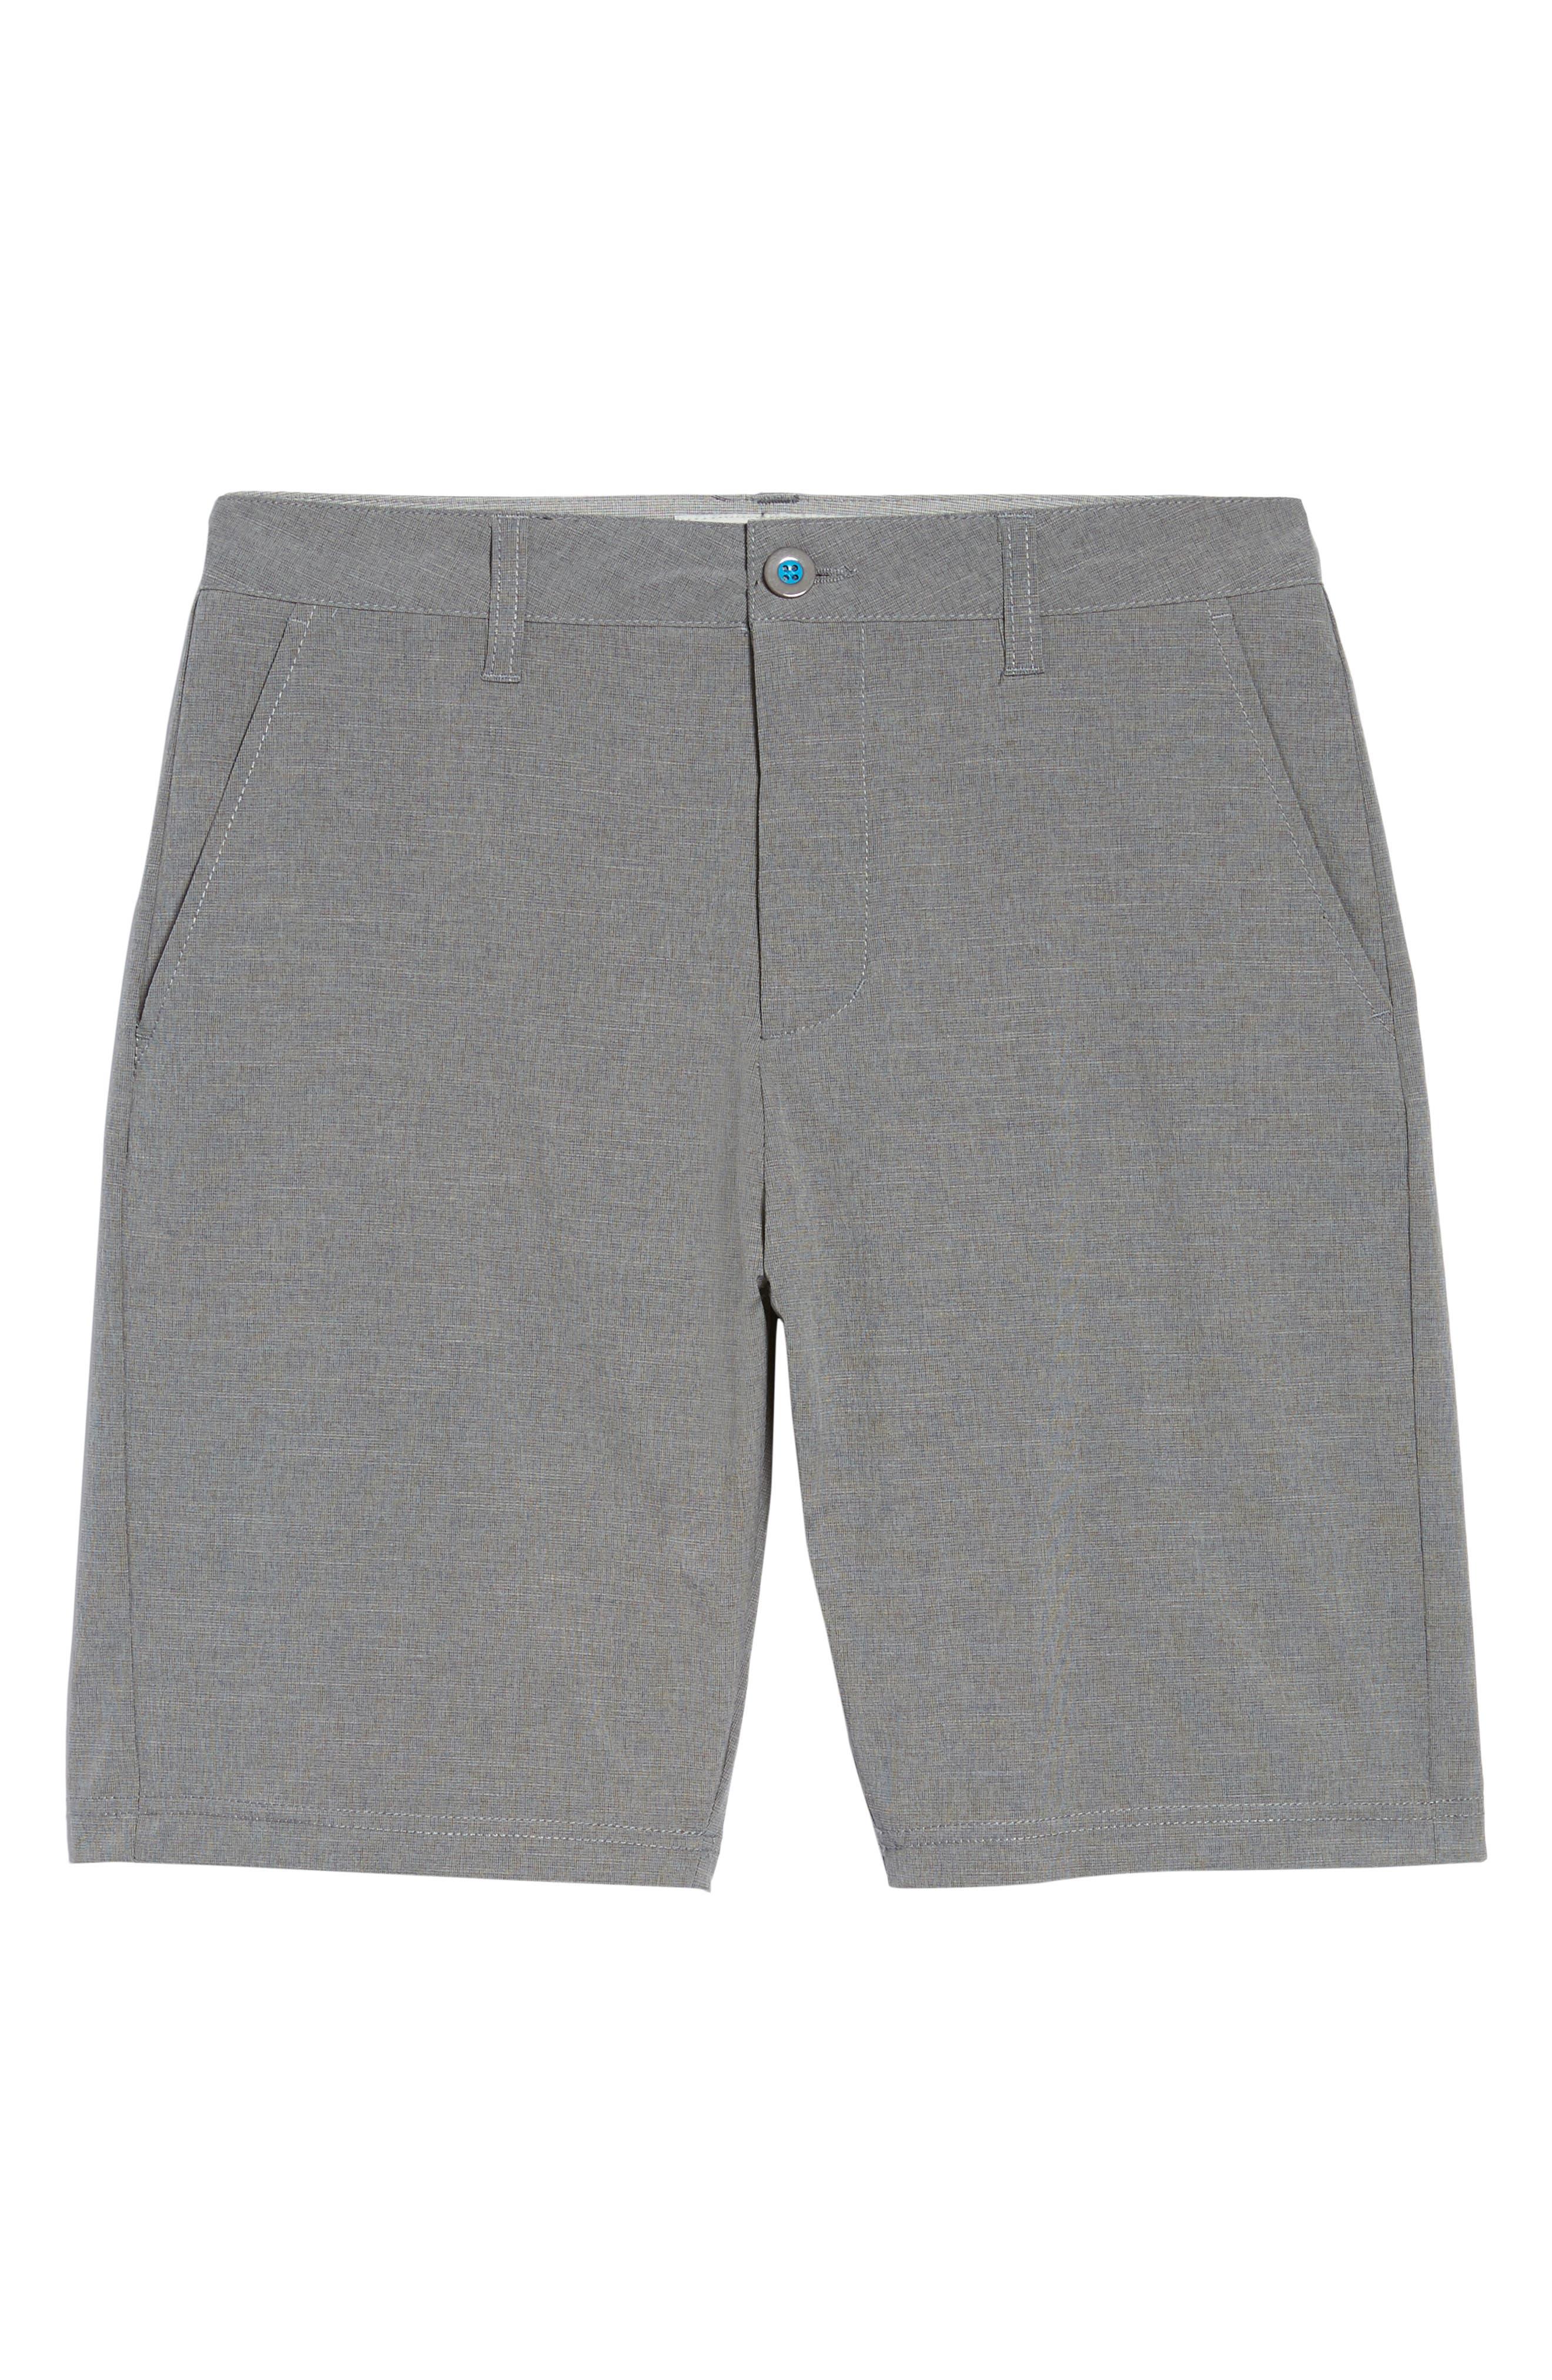 DEVEREUX, Cruiser Hybrid Shorts, Alternate thumbnail 6, color, CHARCOAL